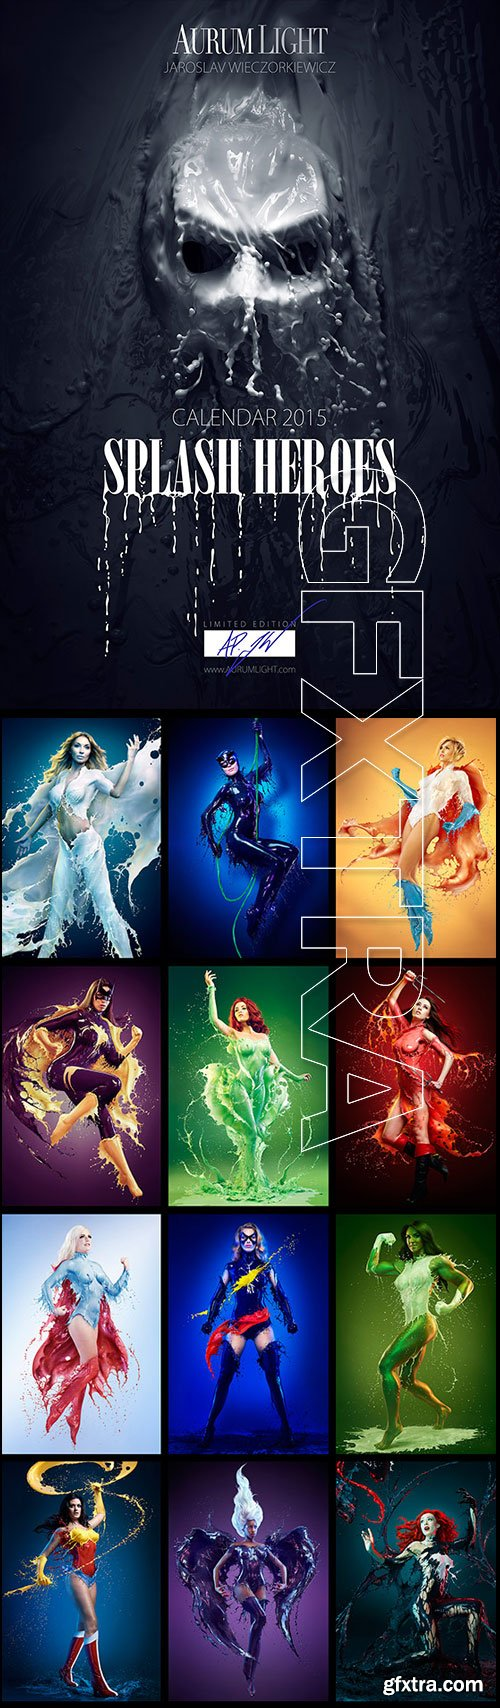 Aurum Light Photo Artworks 2015 Calendar - Jaroslav Wieczorkiewicz